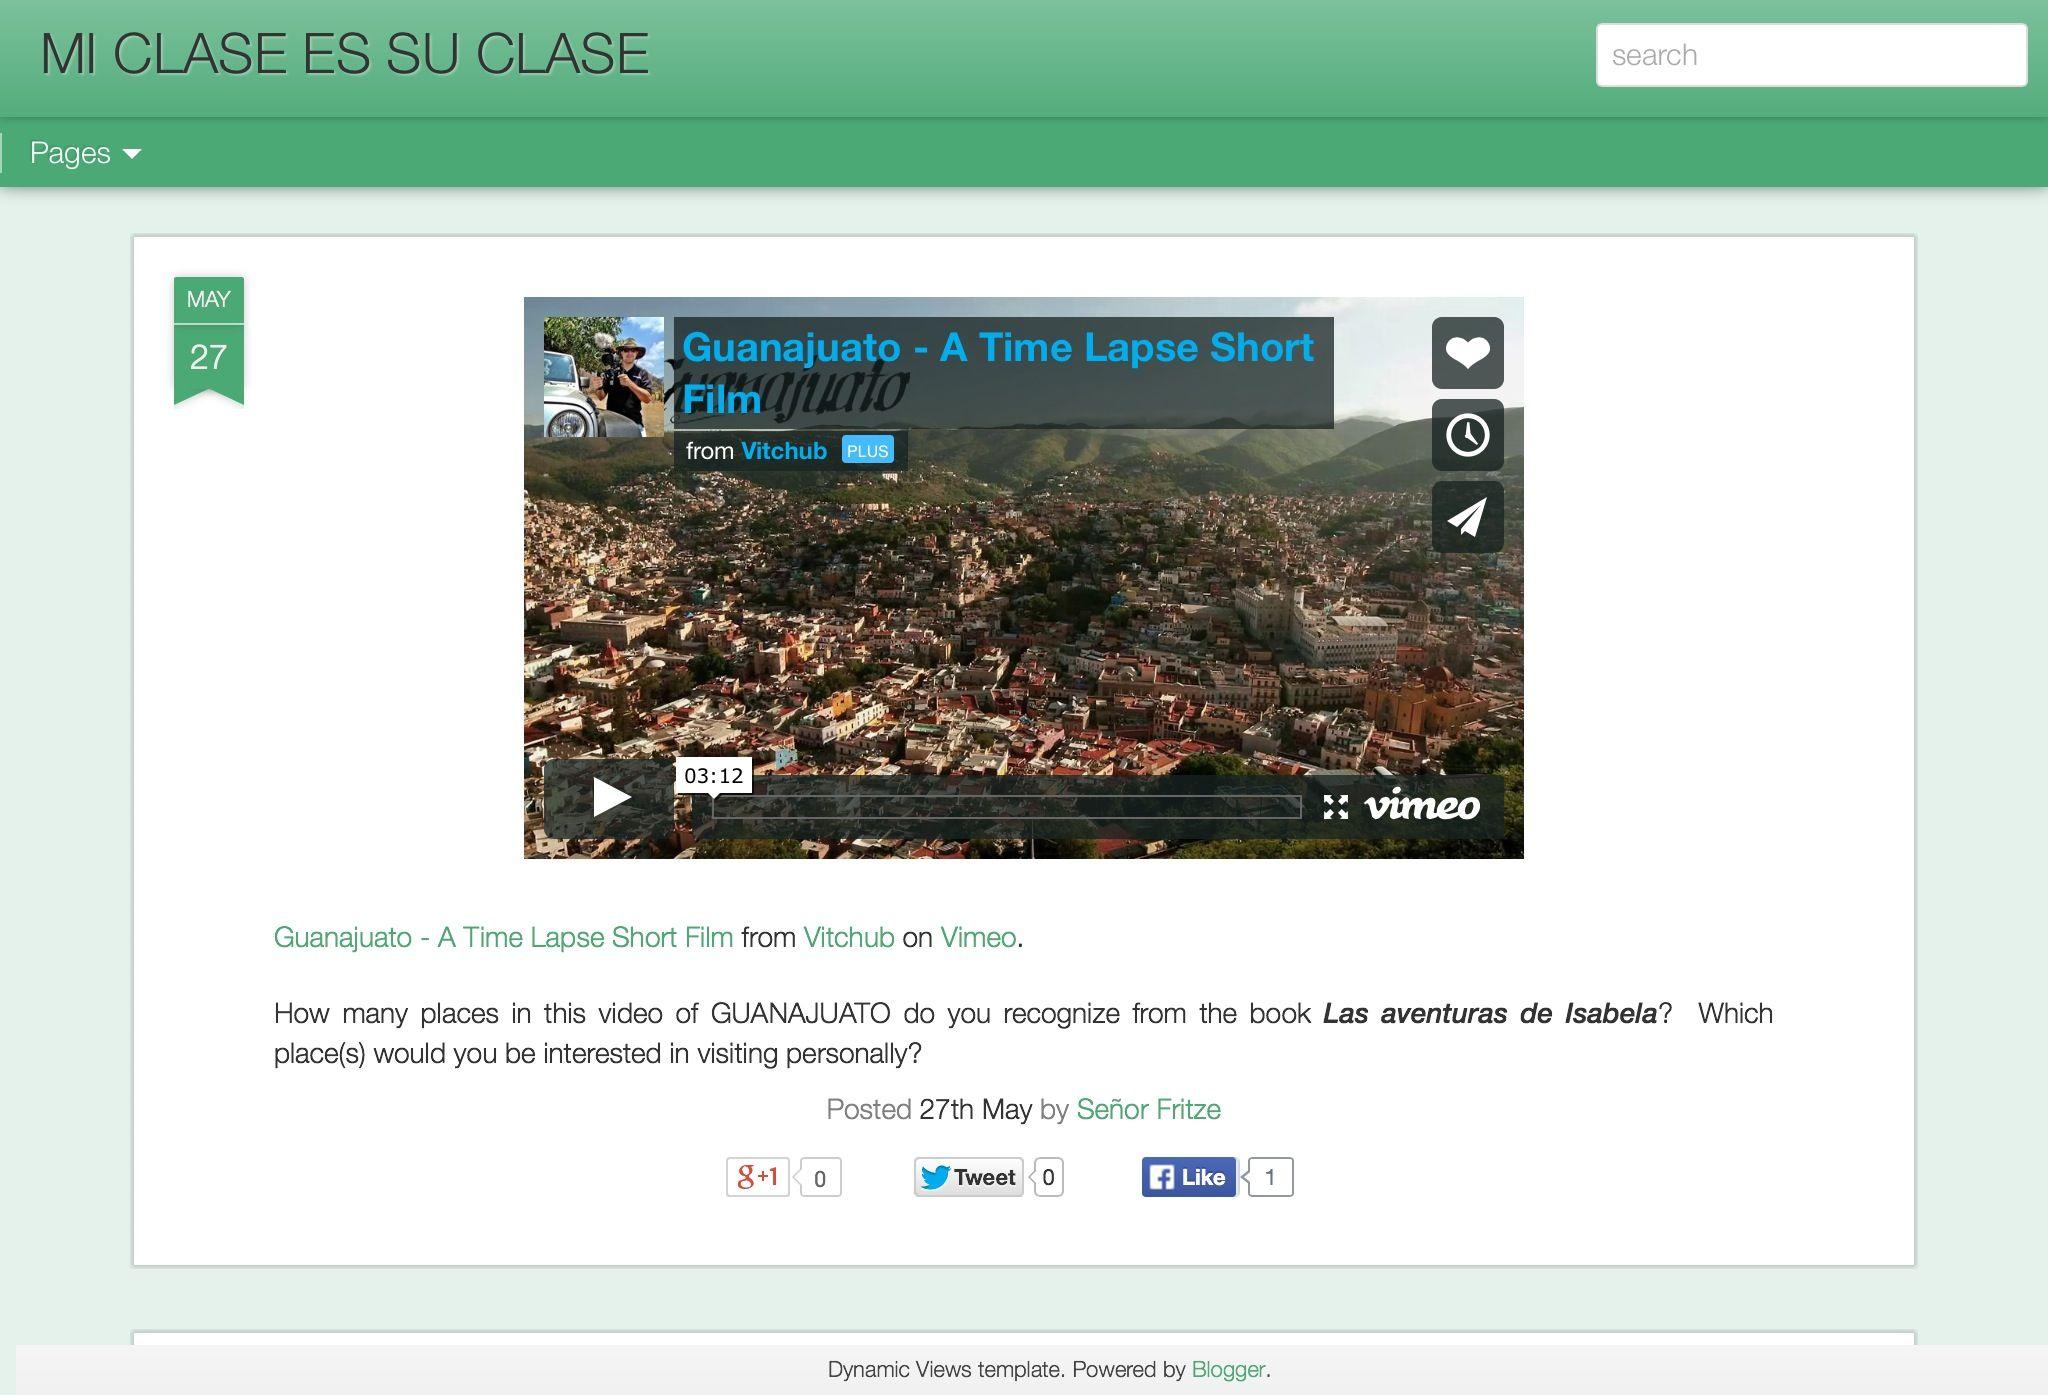 Mi clase es su clase; Jason Fritze blog